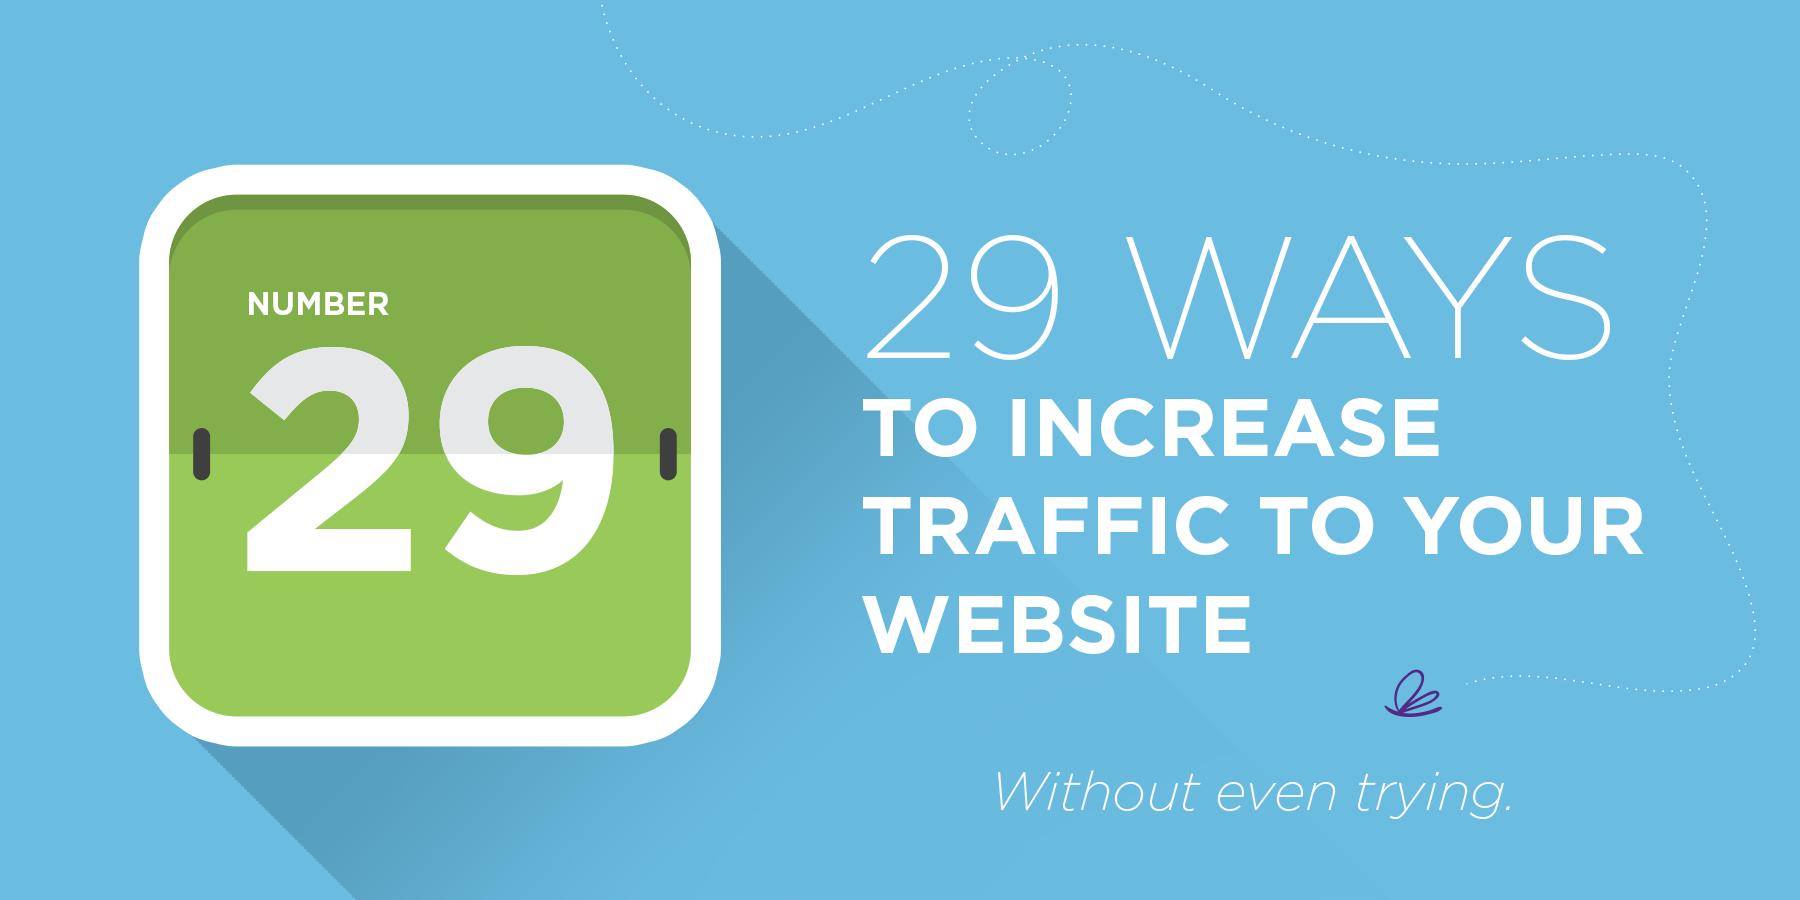 Digital Media Marketing Agency AcuMedia provides 29 helpful and easy tips to increase website traffic